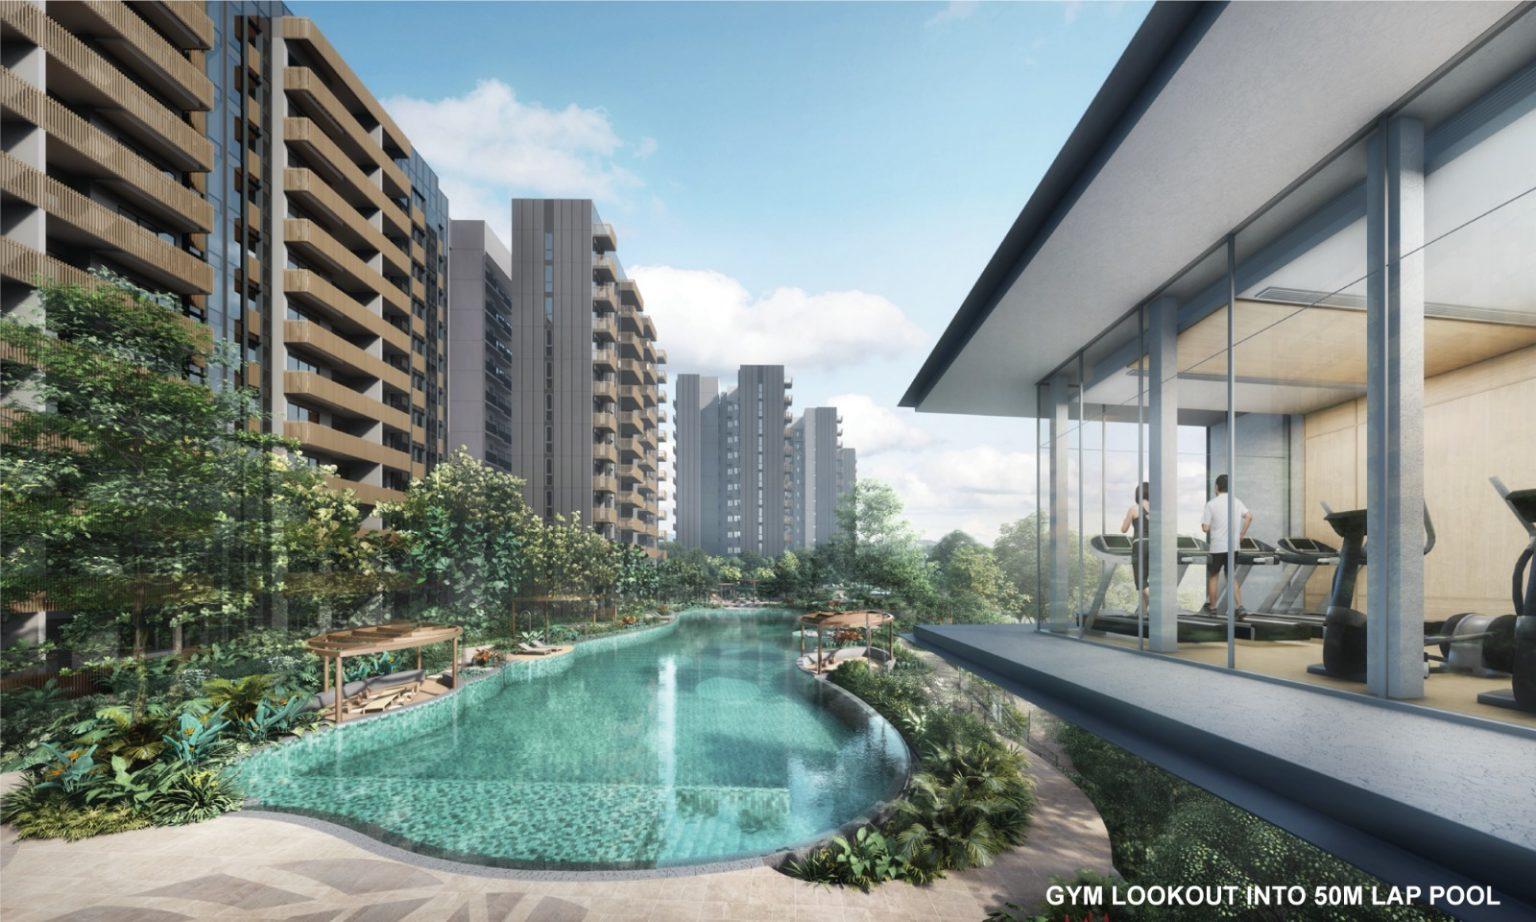 Ki-Condominium-Gym-and-Pool-1536x922